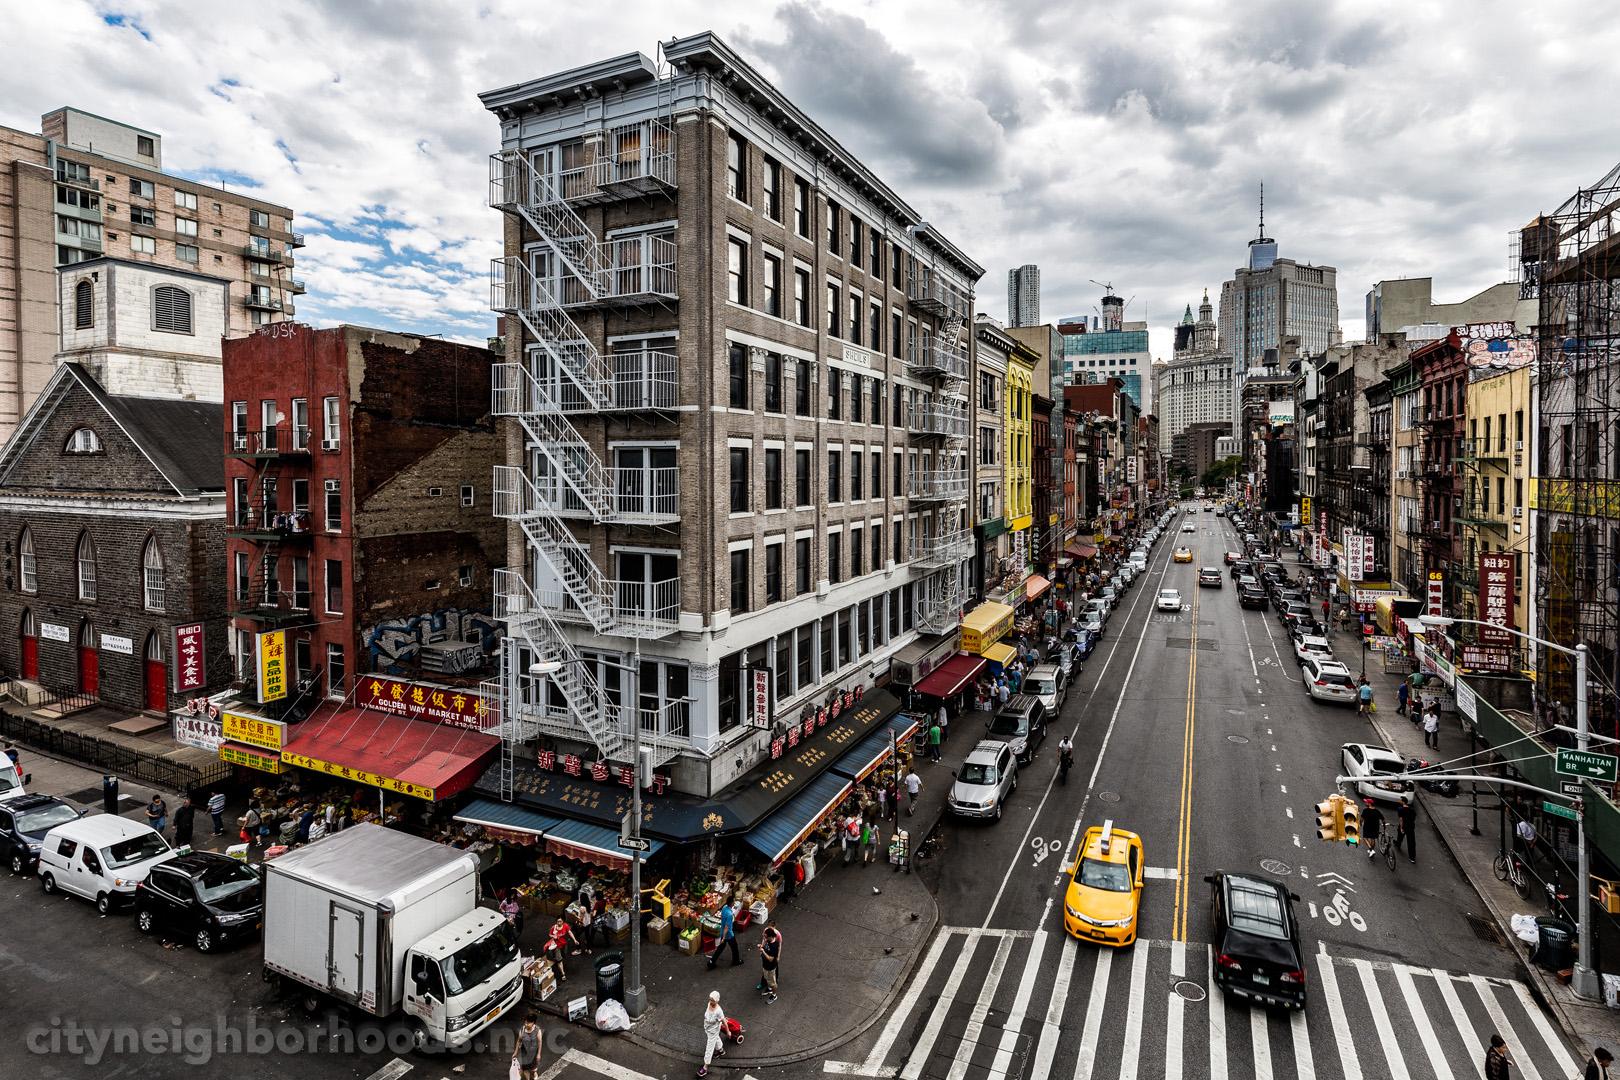 Market Street and East Broadway, from the Manhattan Bridge - Chinatown - Manhattan - NYC